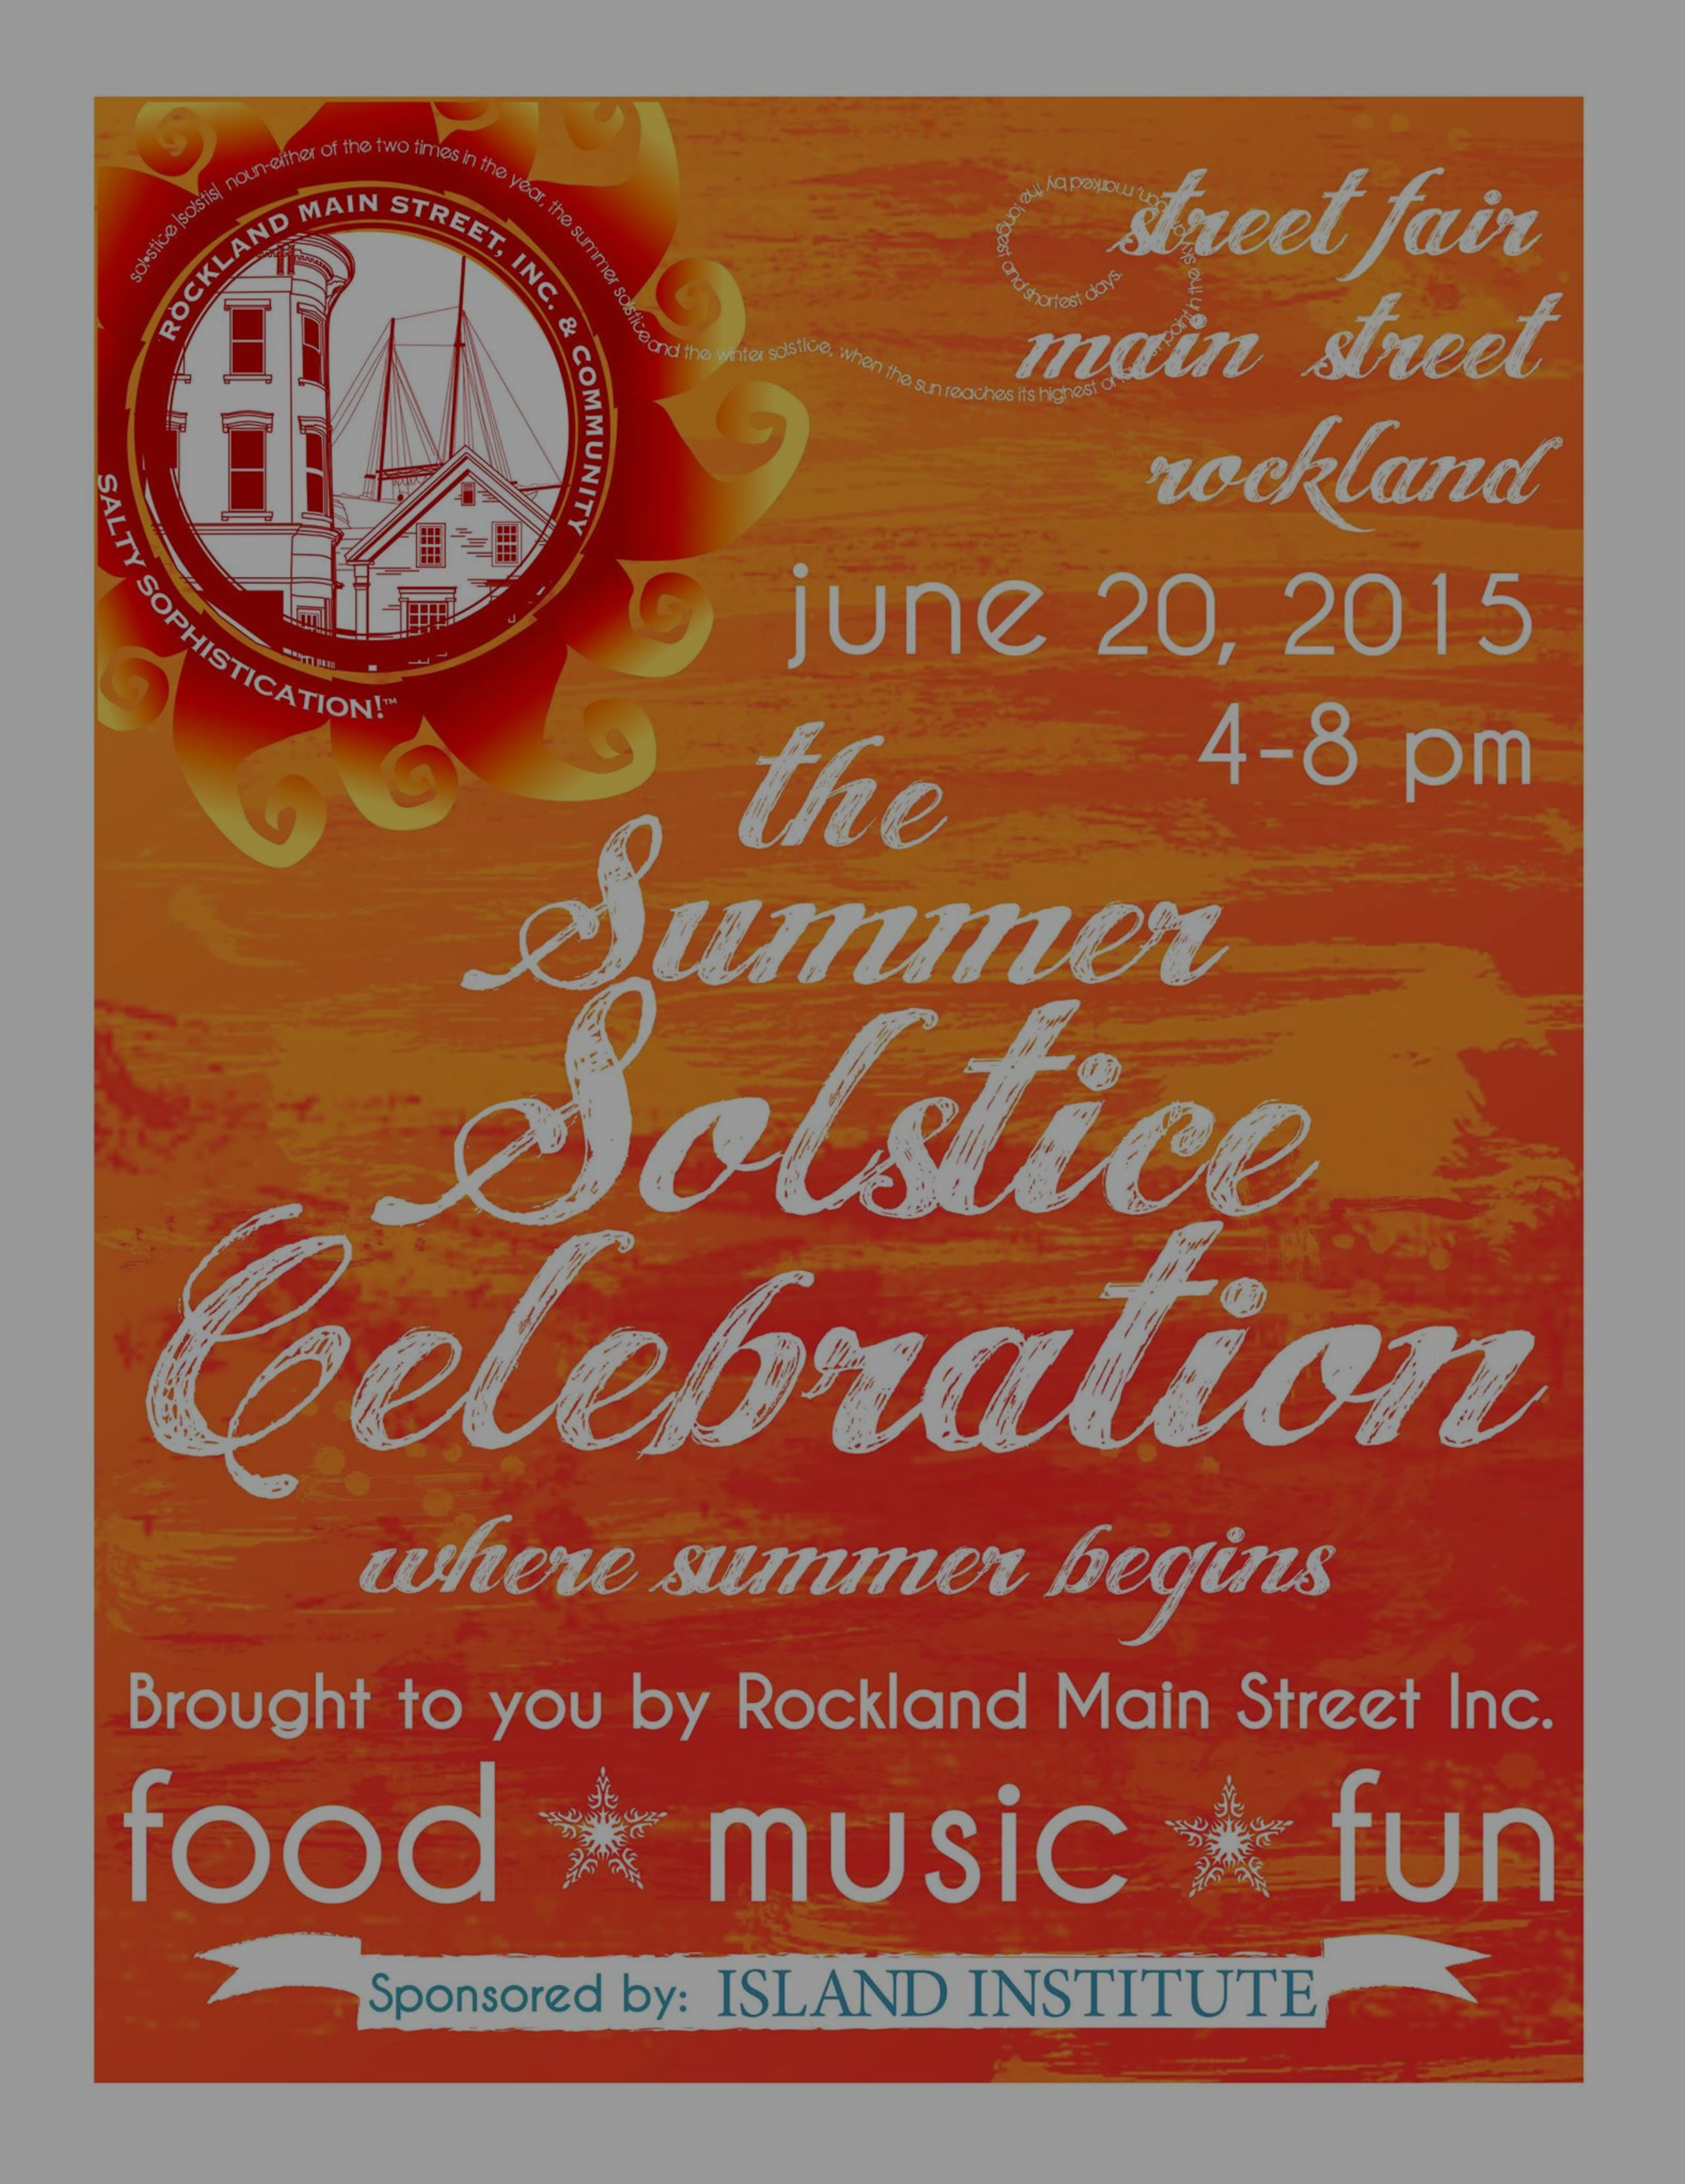 Downtown Rockland Event: Summer Solstice Celebration